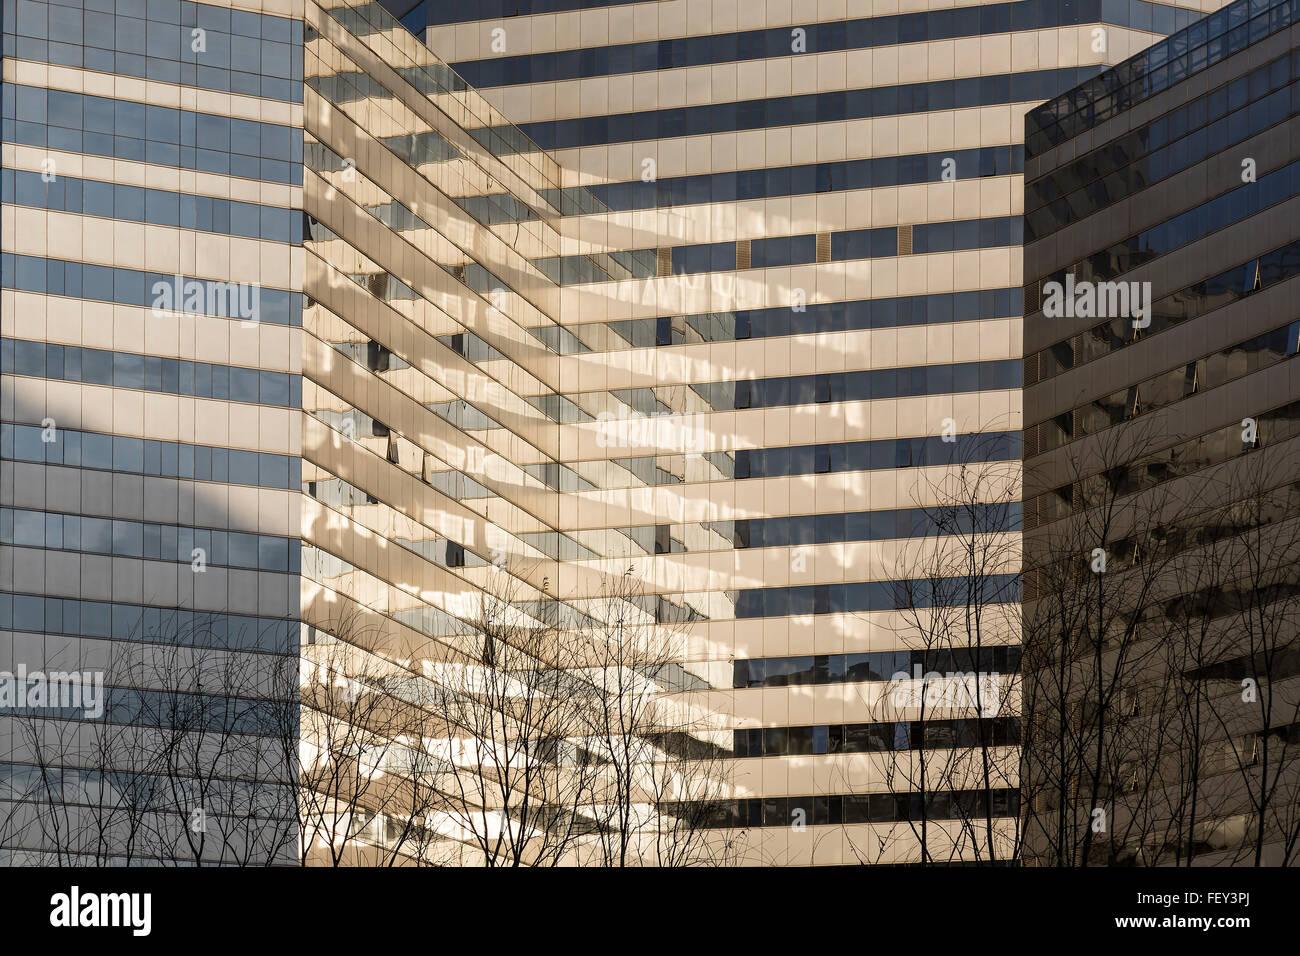 Peking, China. Februar 2016 - Glas Gebäude Abstraktion. Stockbild